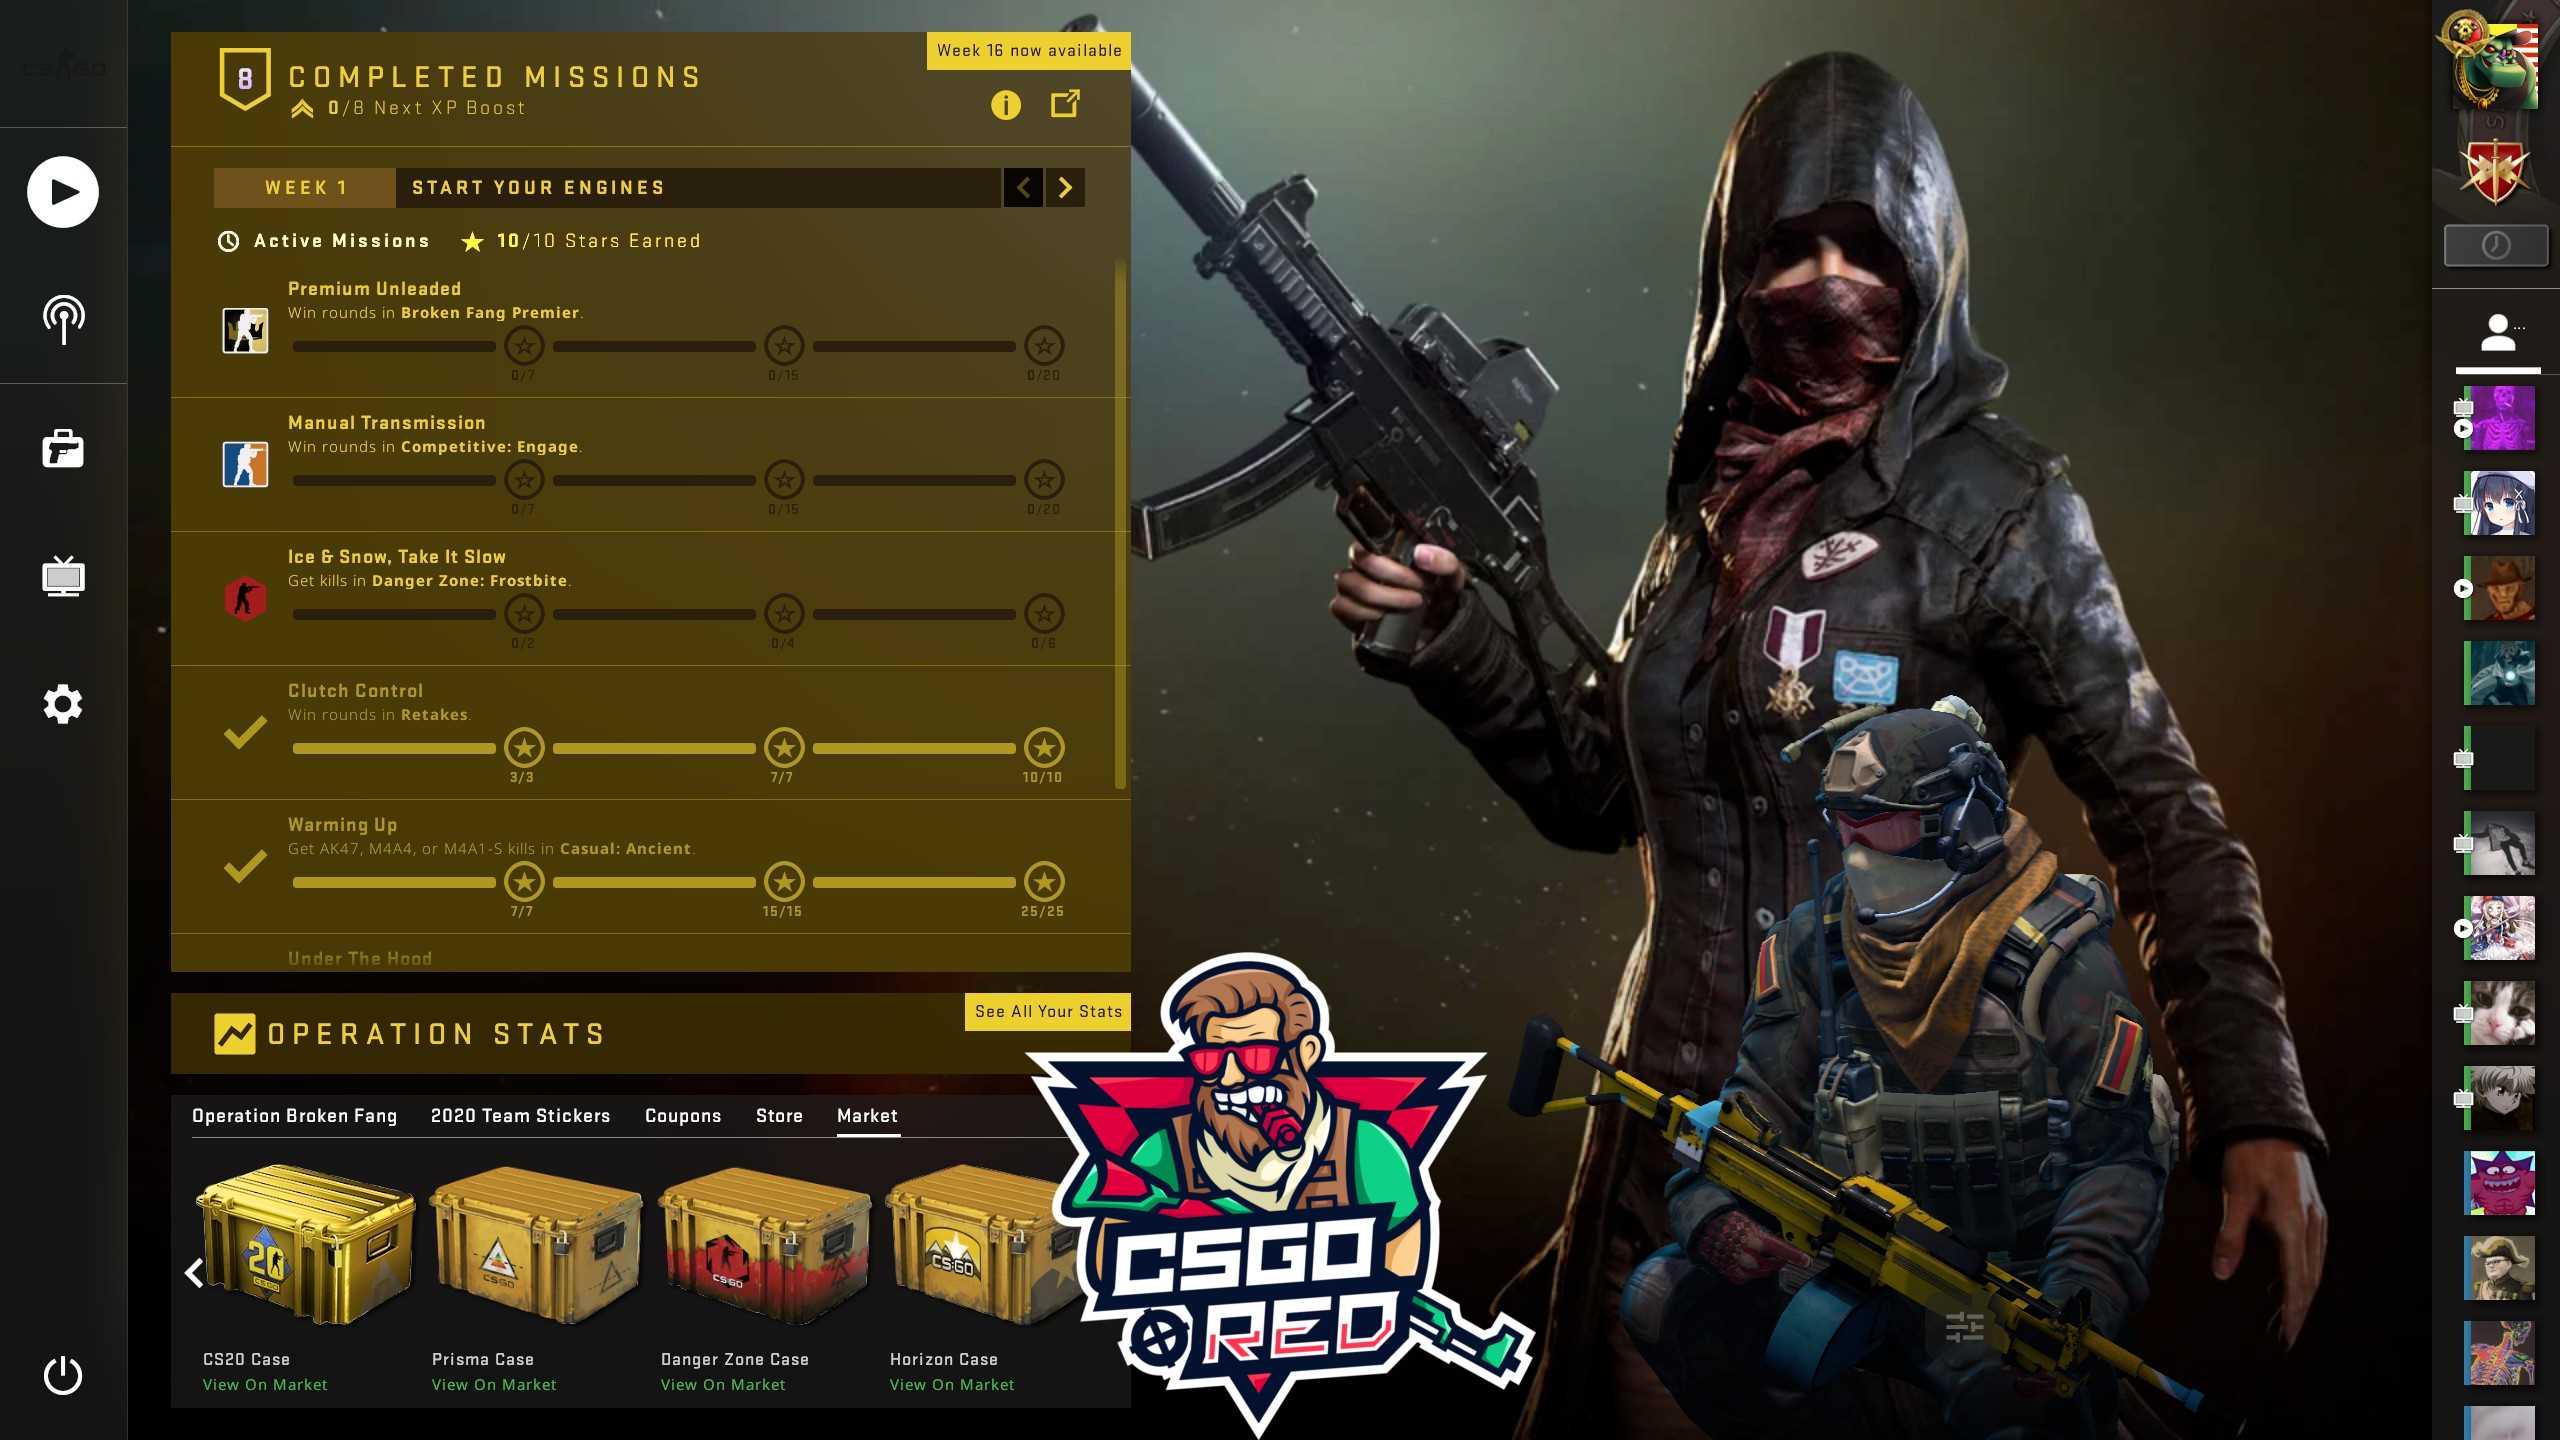 PlayerUnknown's Battlegrounds CSGO Panorama UI Background